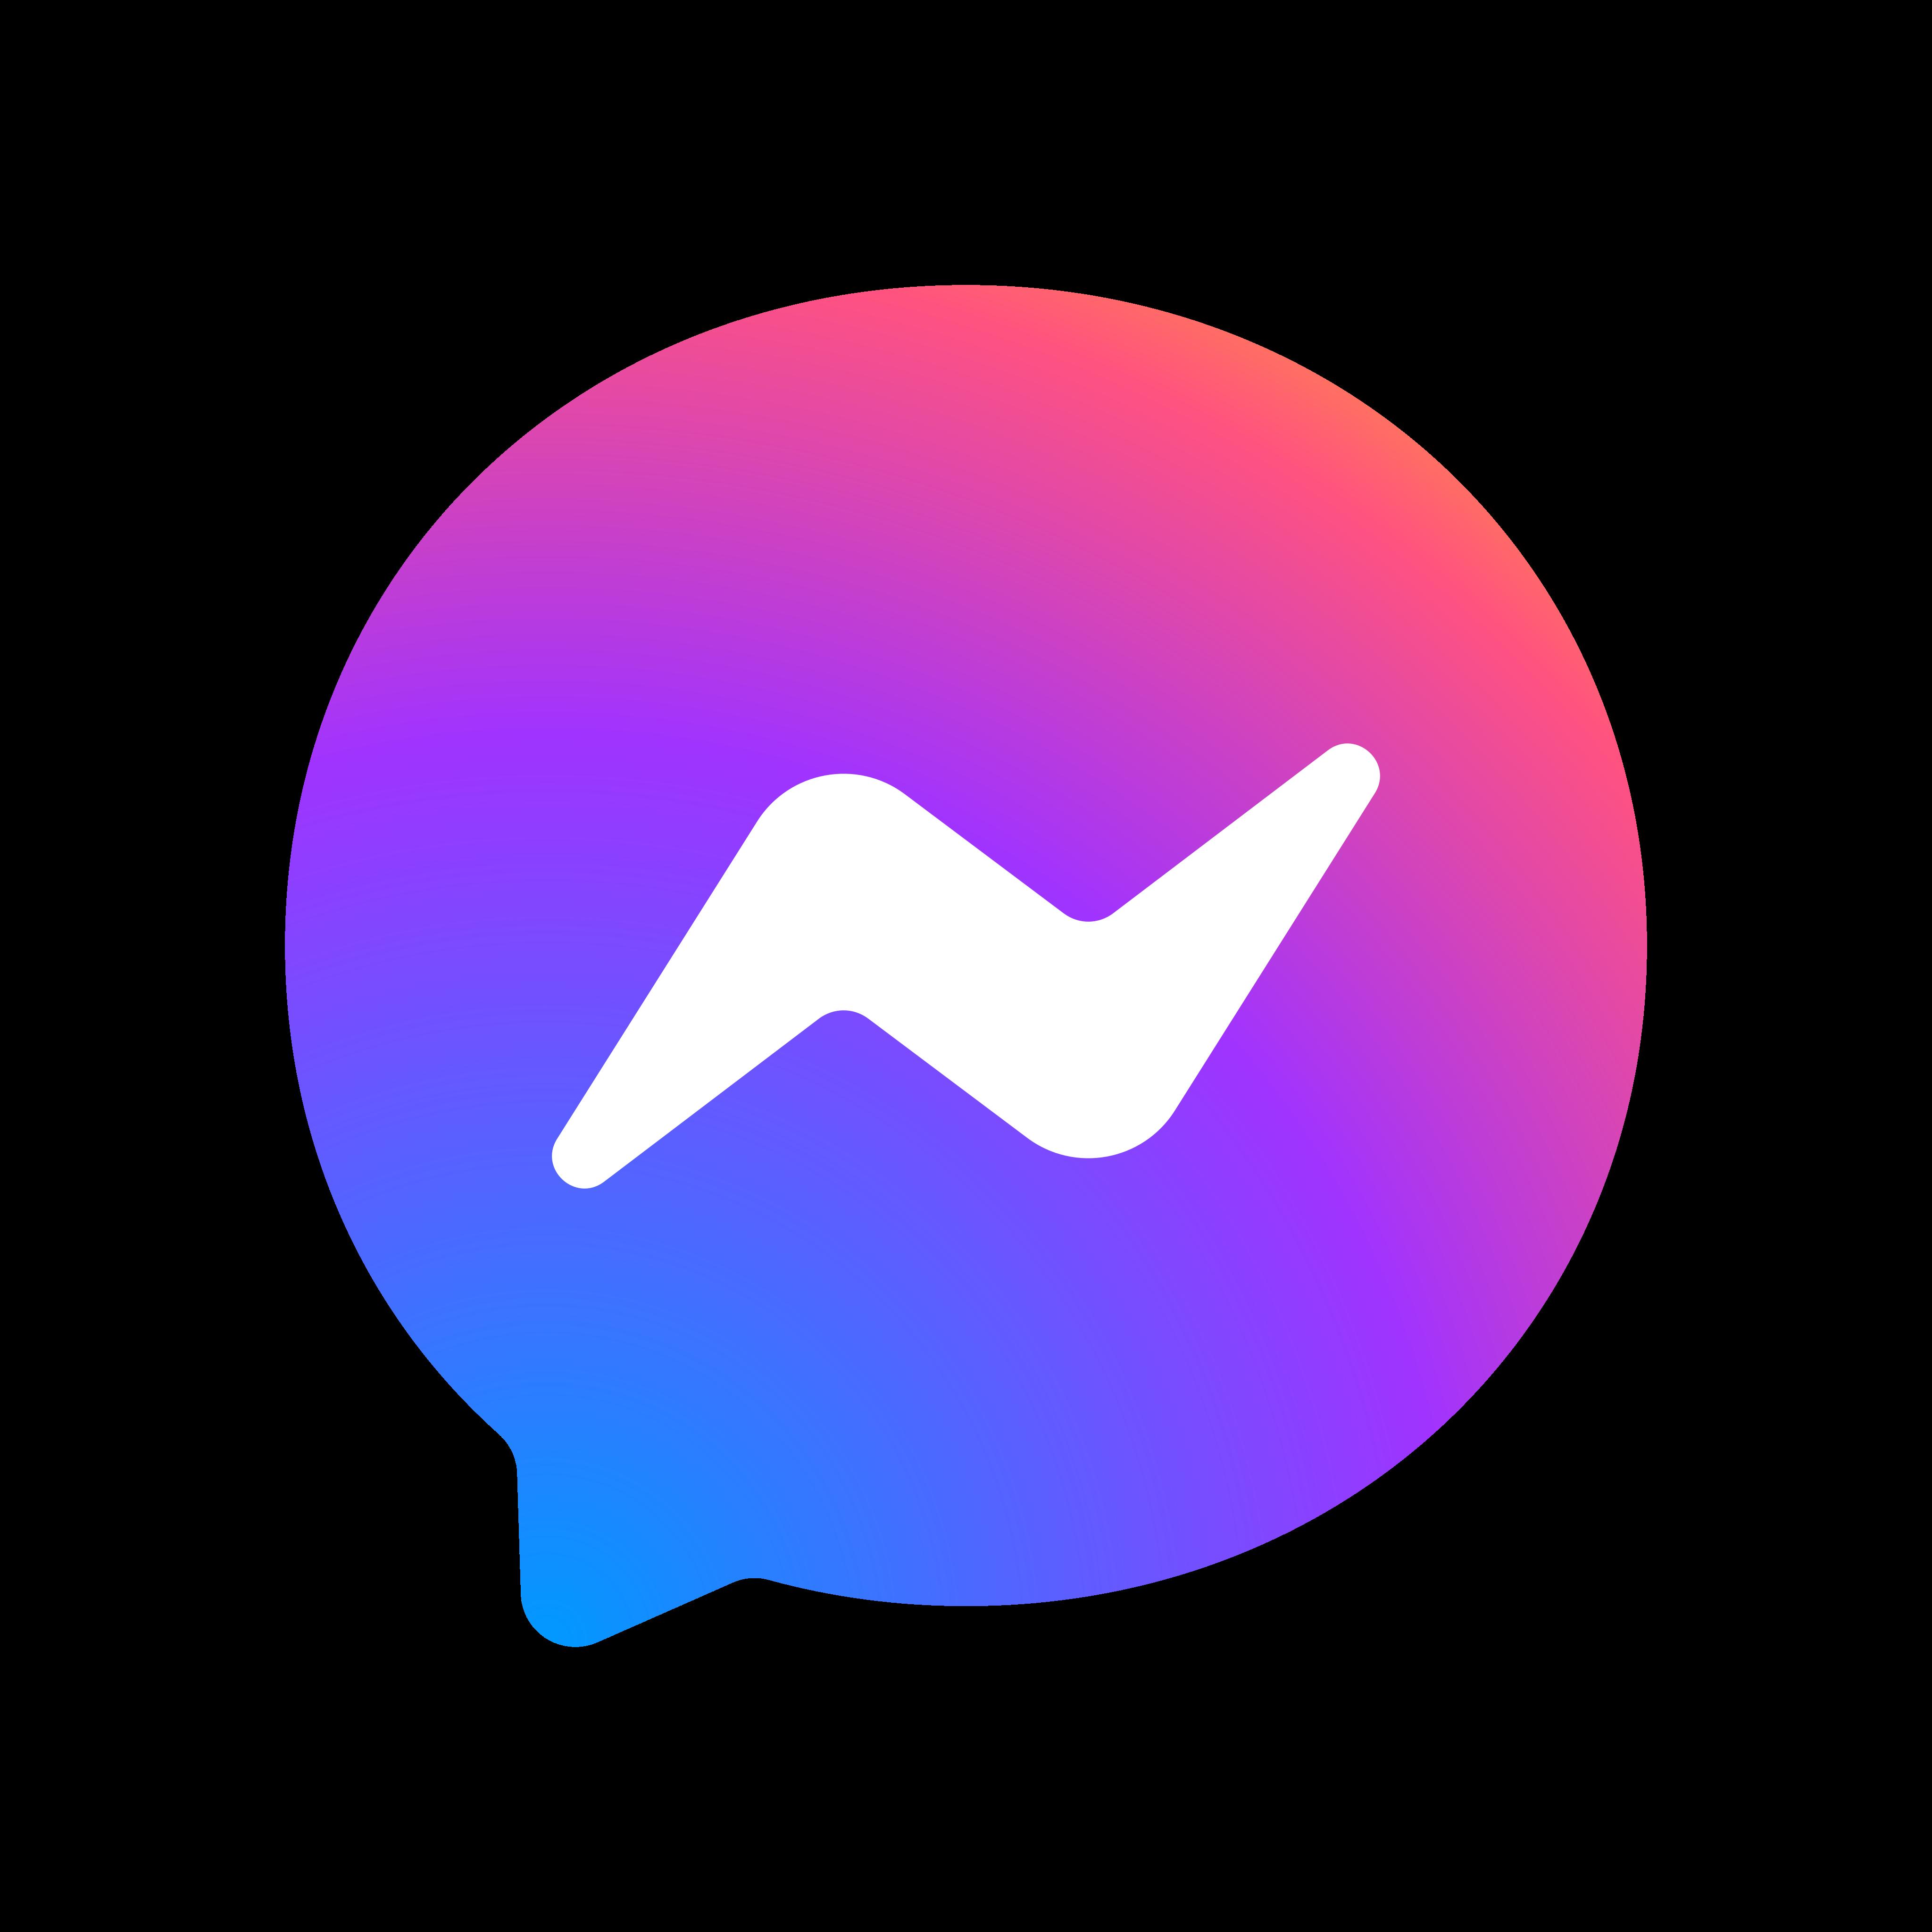 facebook messenger logo 0 1 - Facebook Messenger Logo